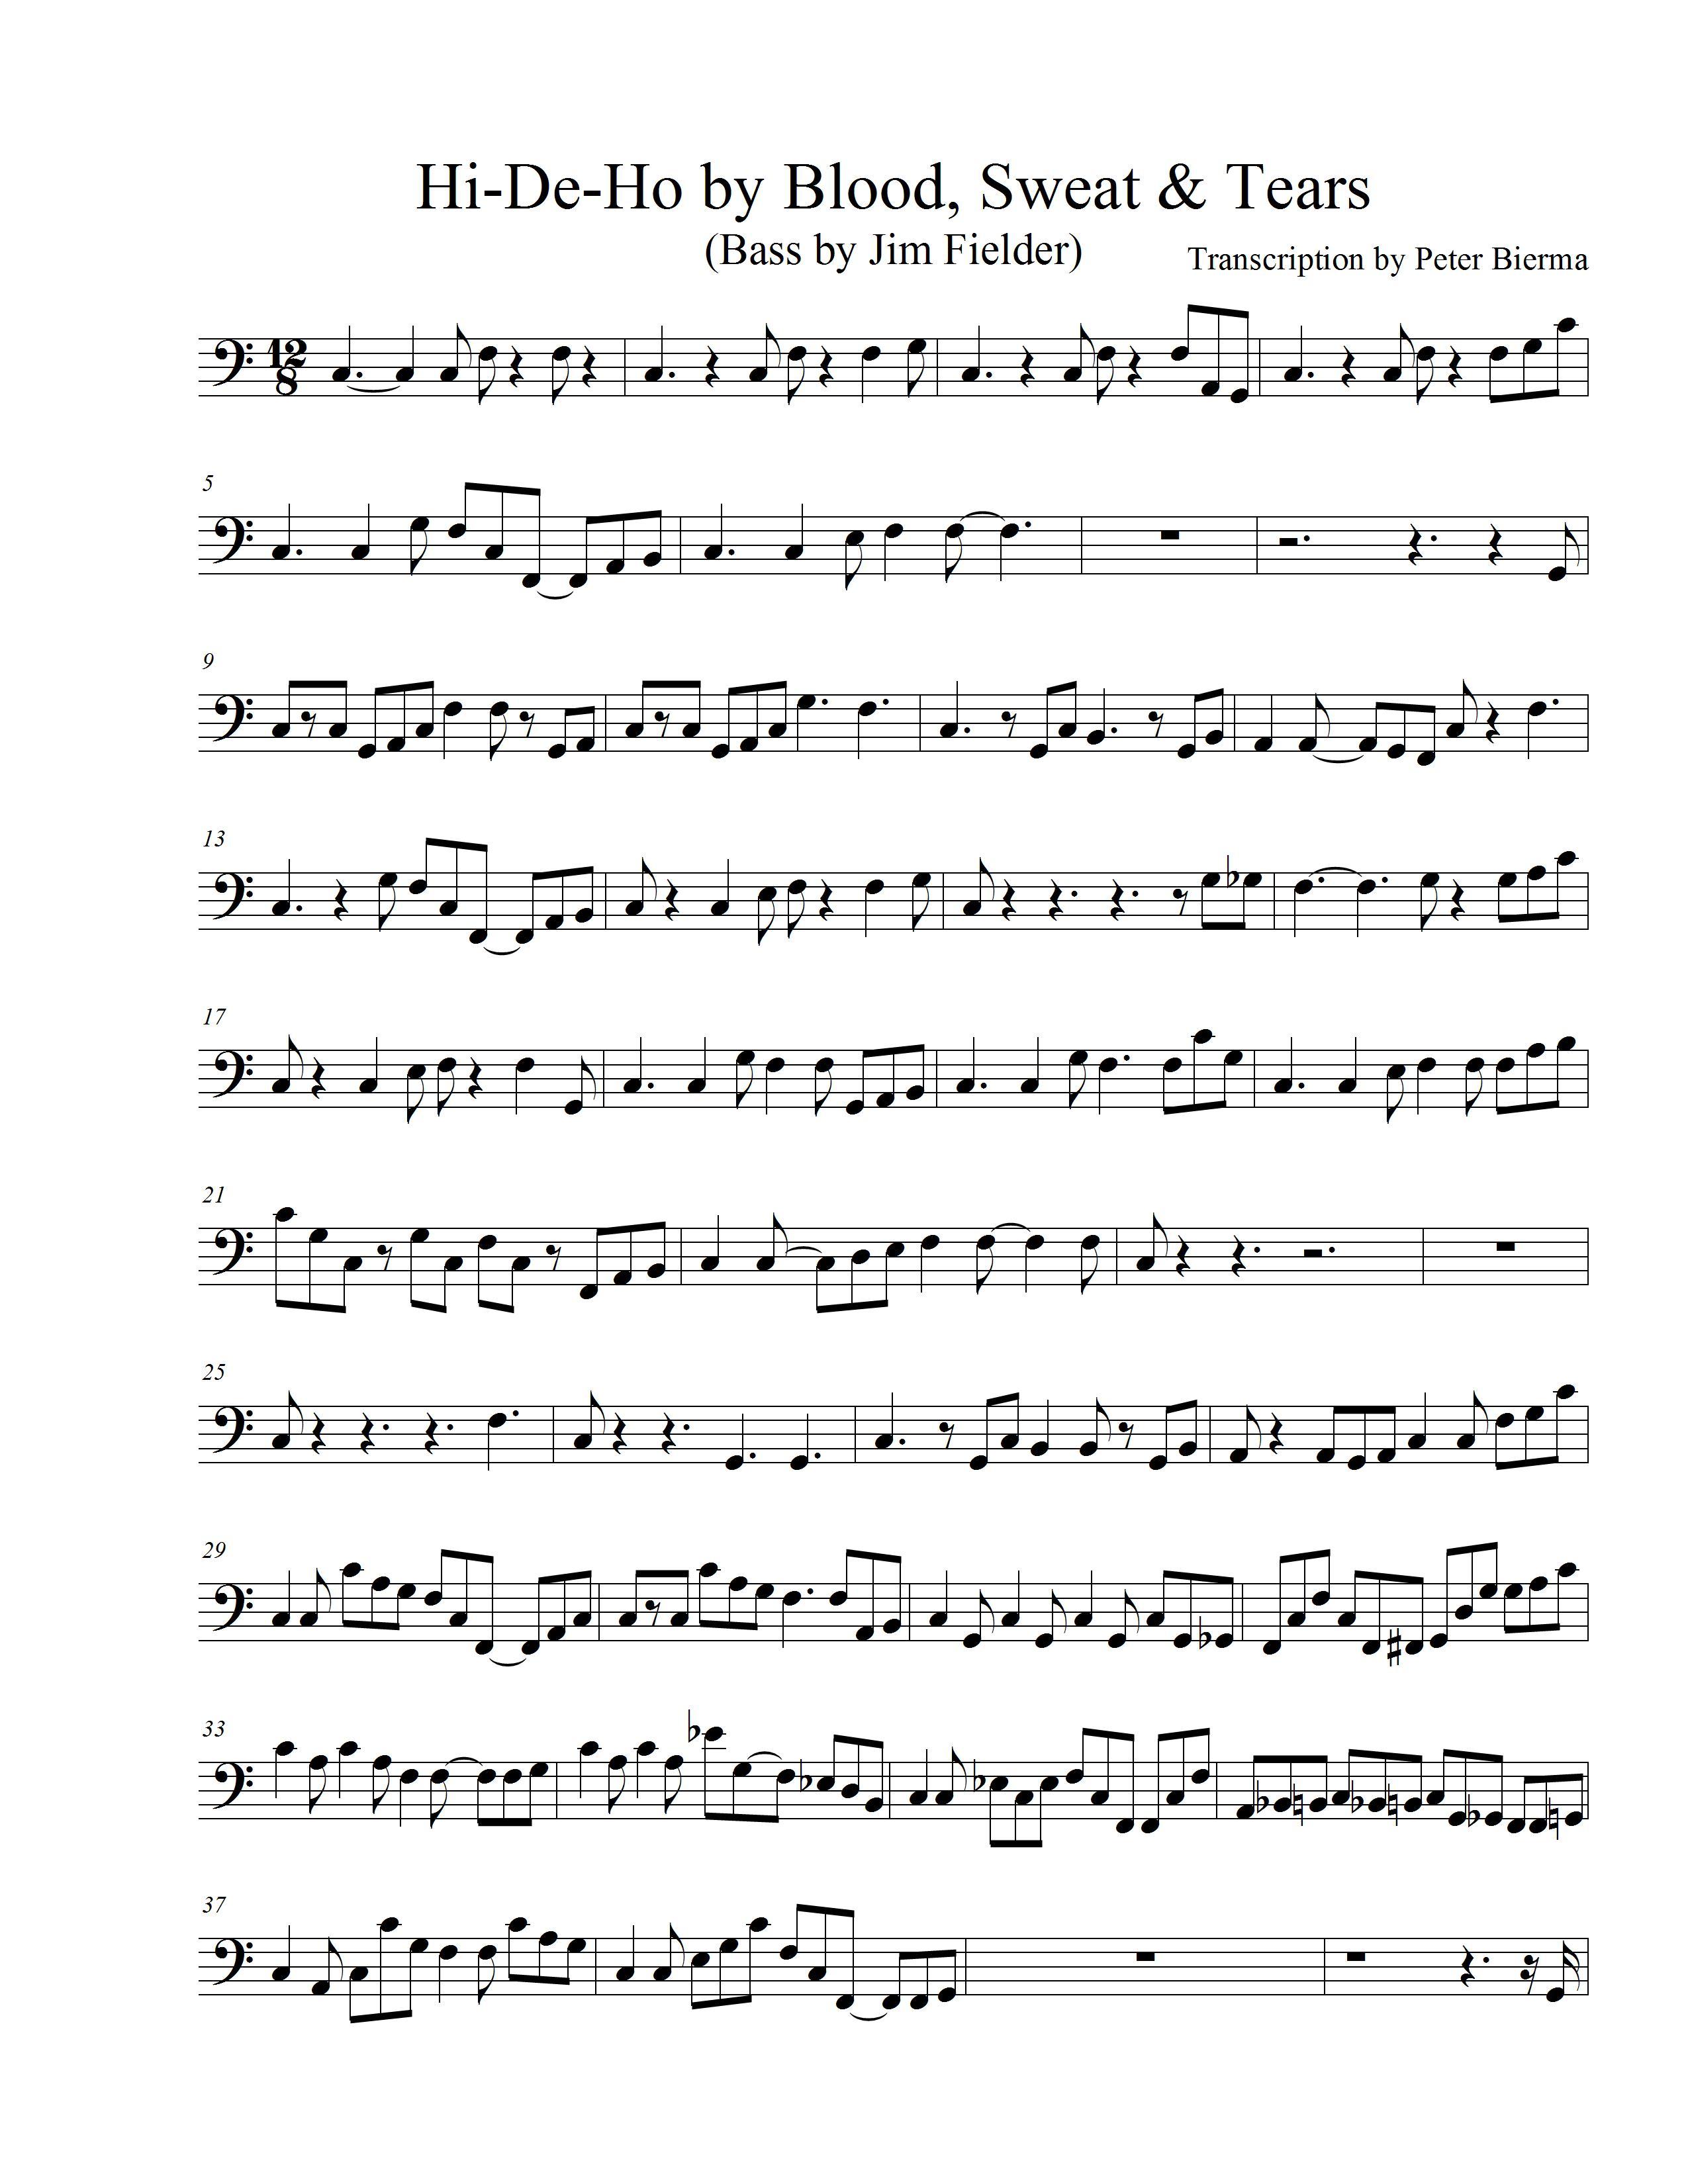 Thebasscase free bass transcriptions hexwebz Choice Image